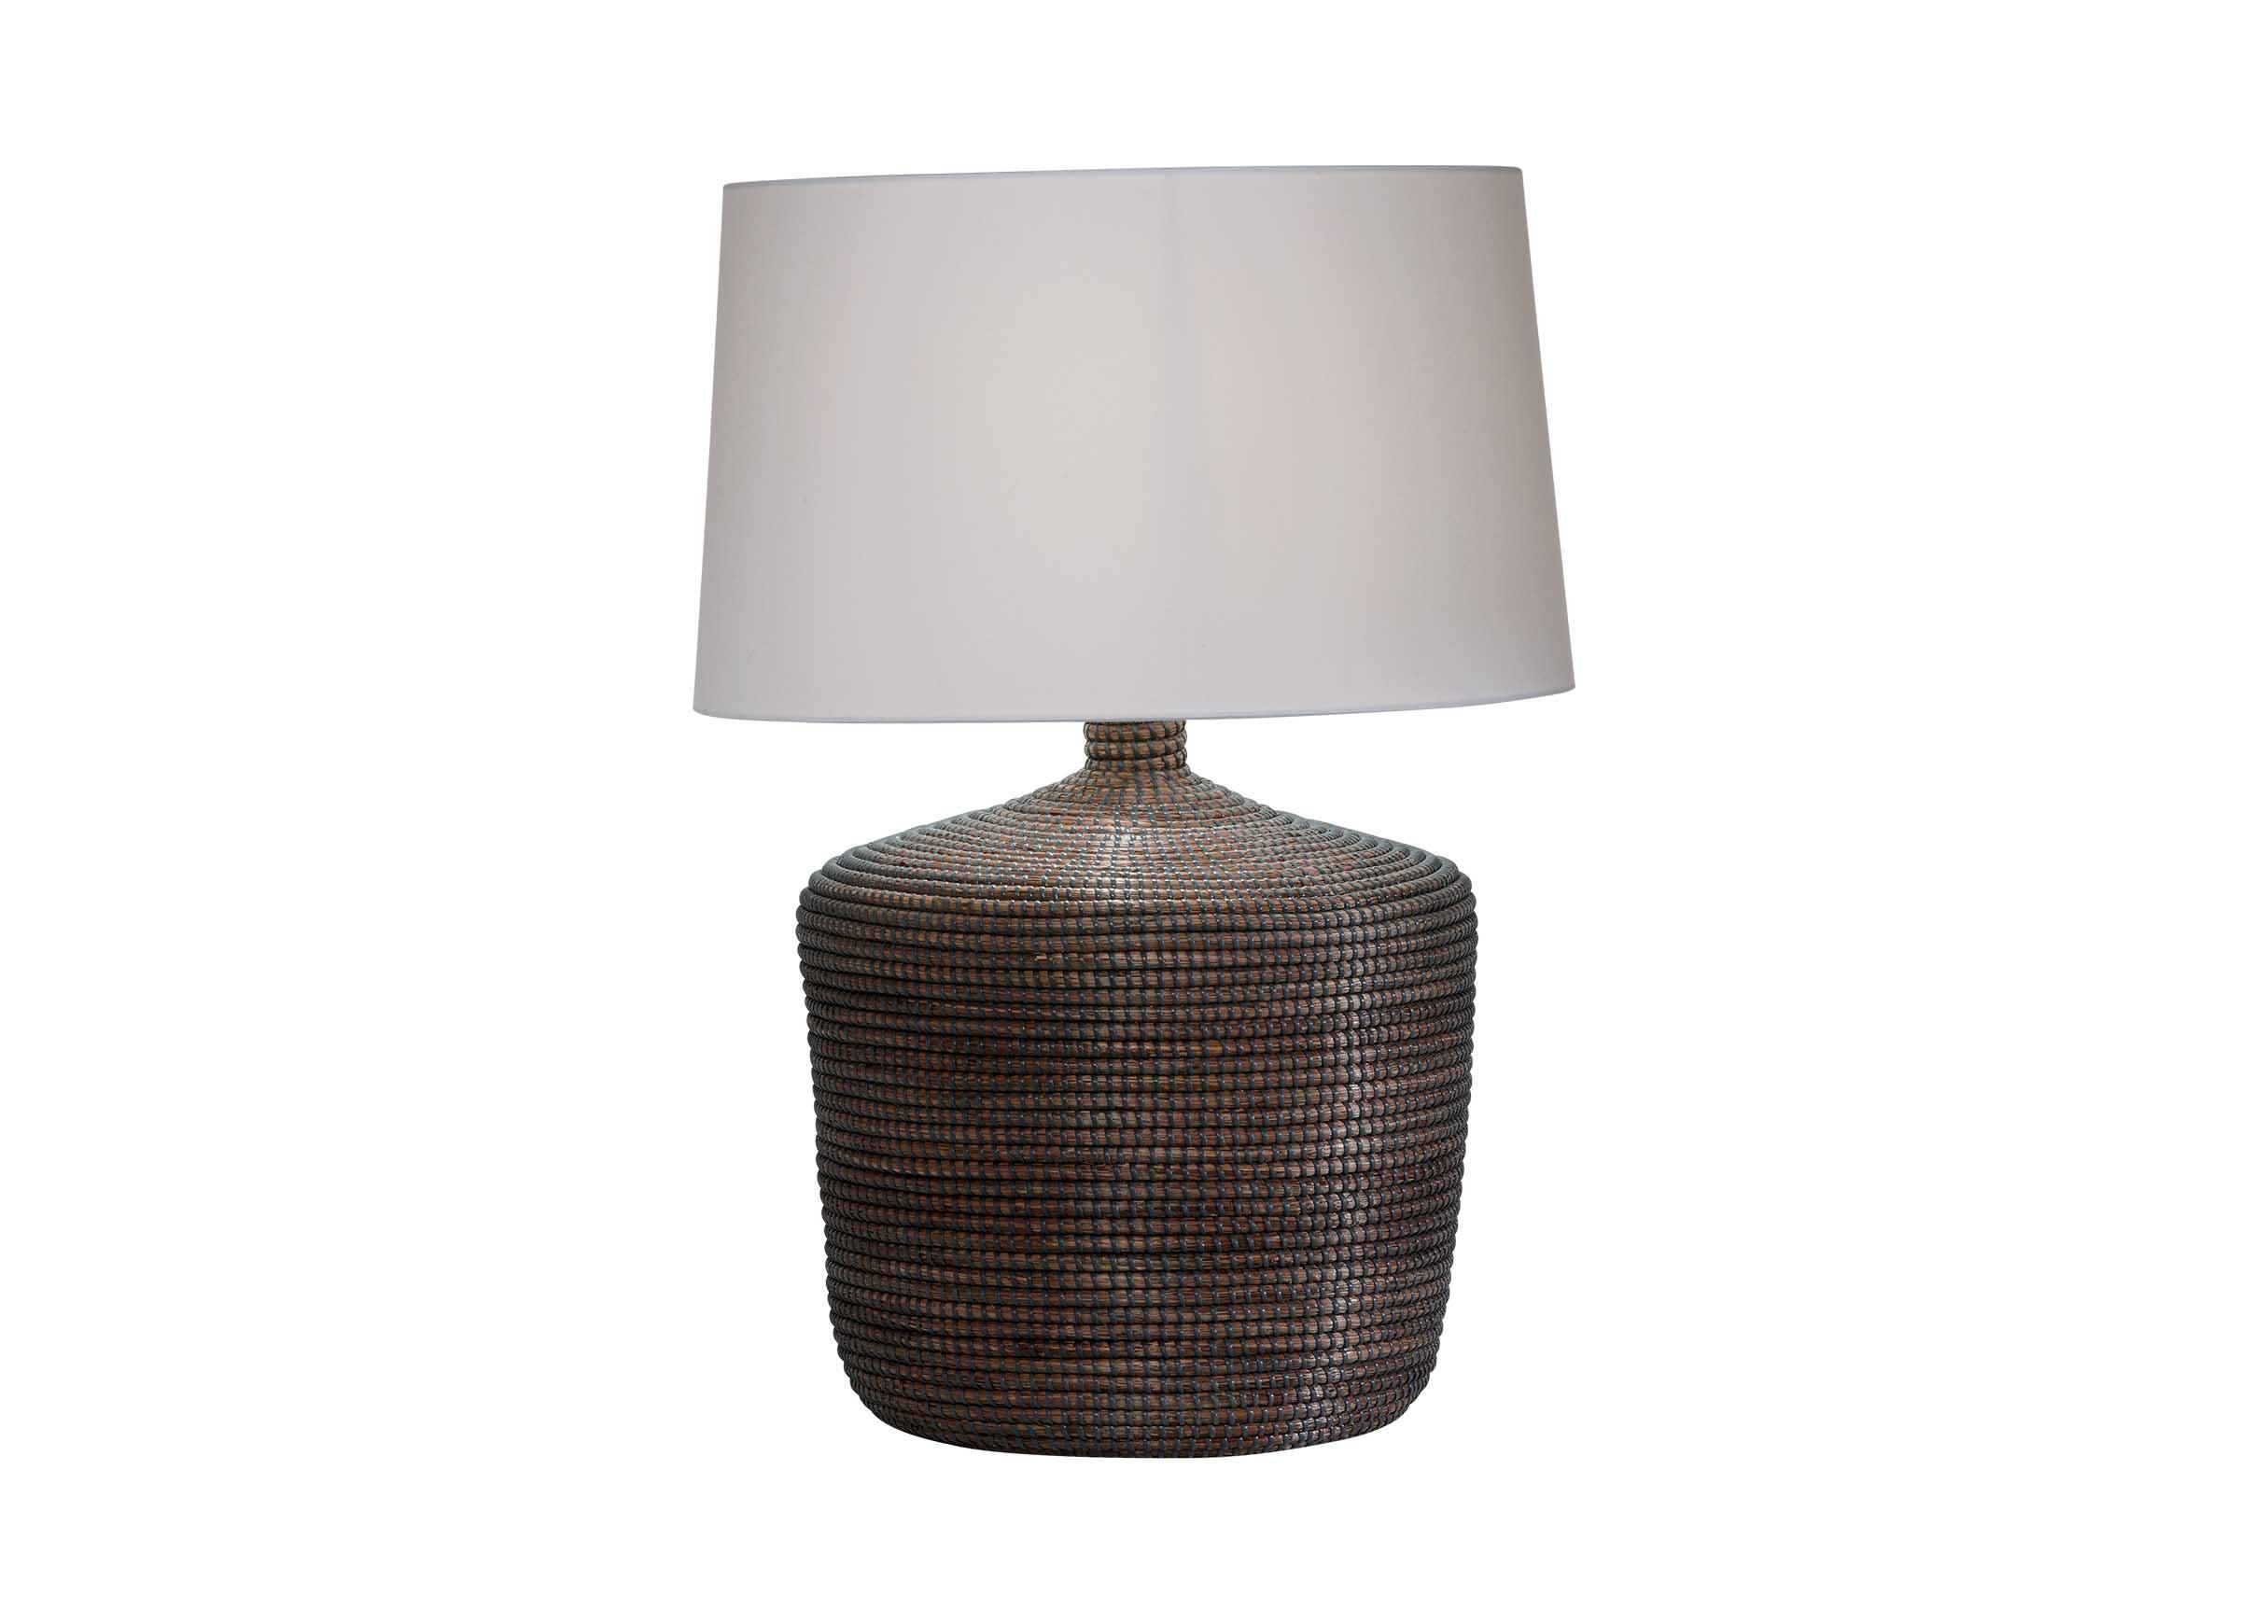 Seneca Woven Table Lamp Table Lamps Ethan Allen